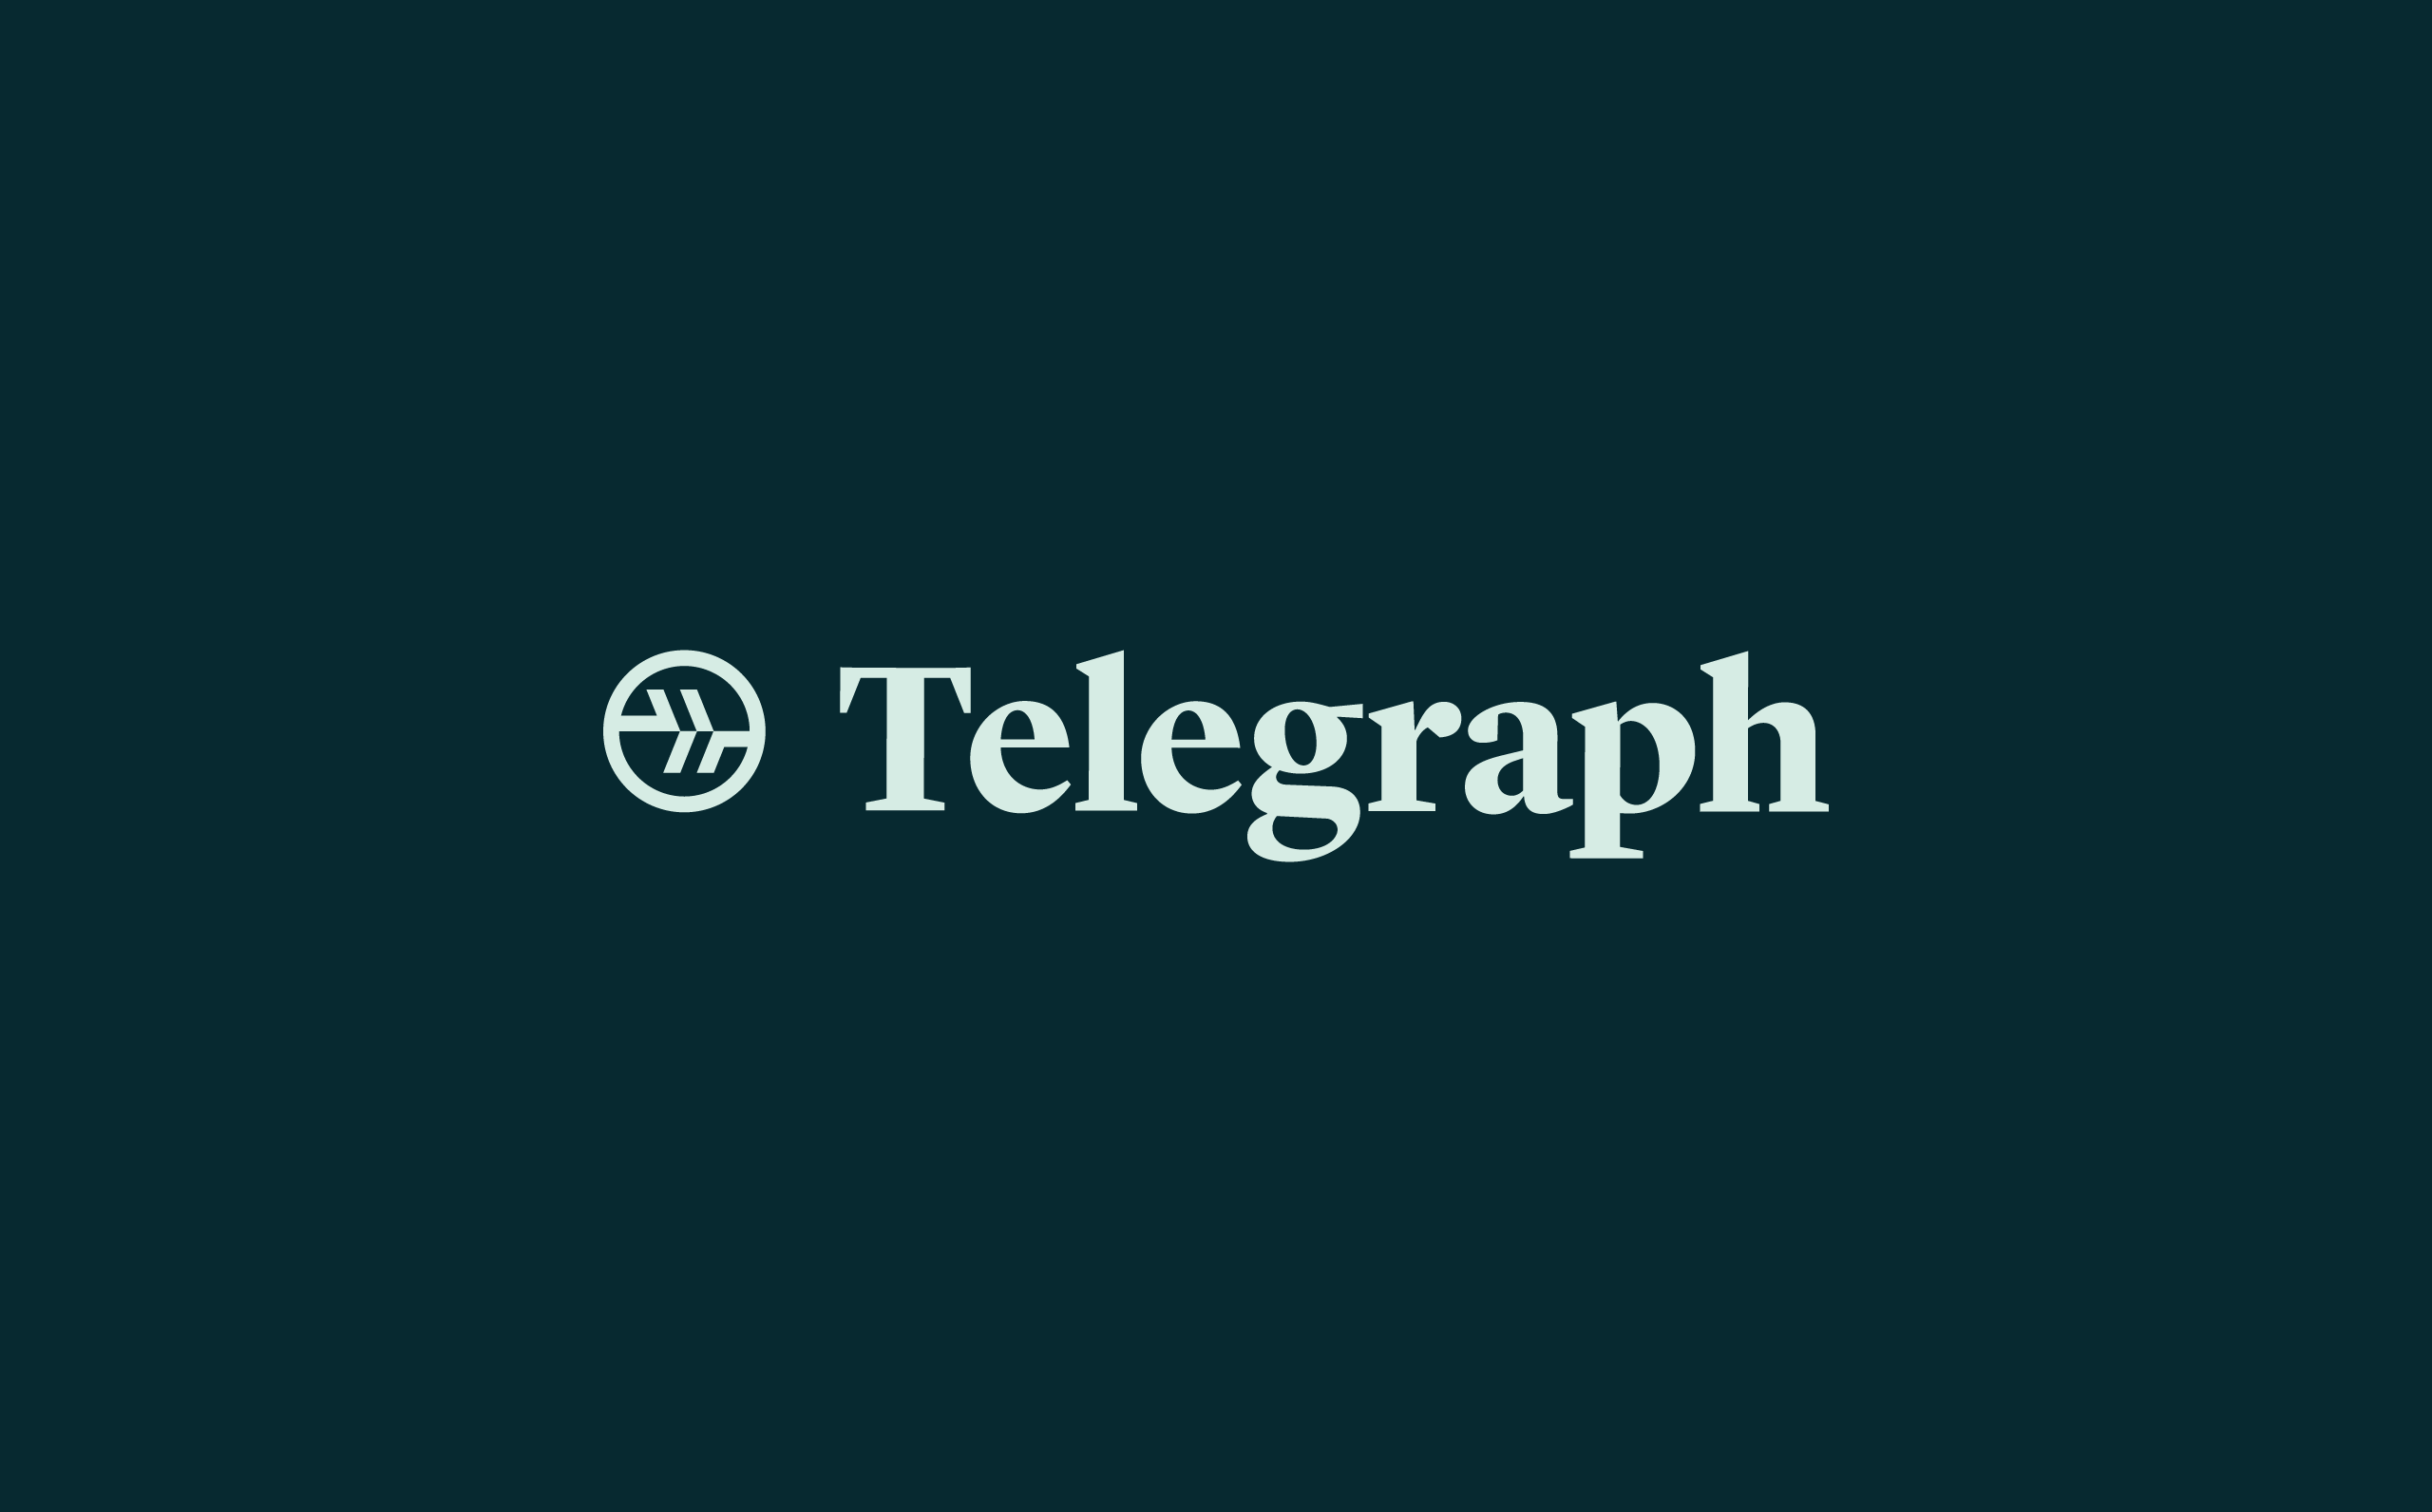 Telegraph_01